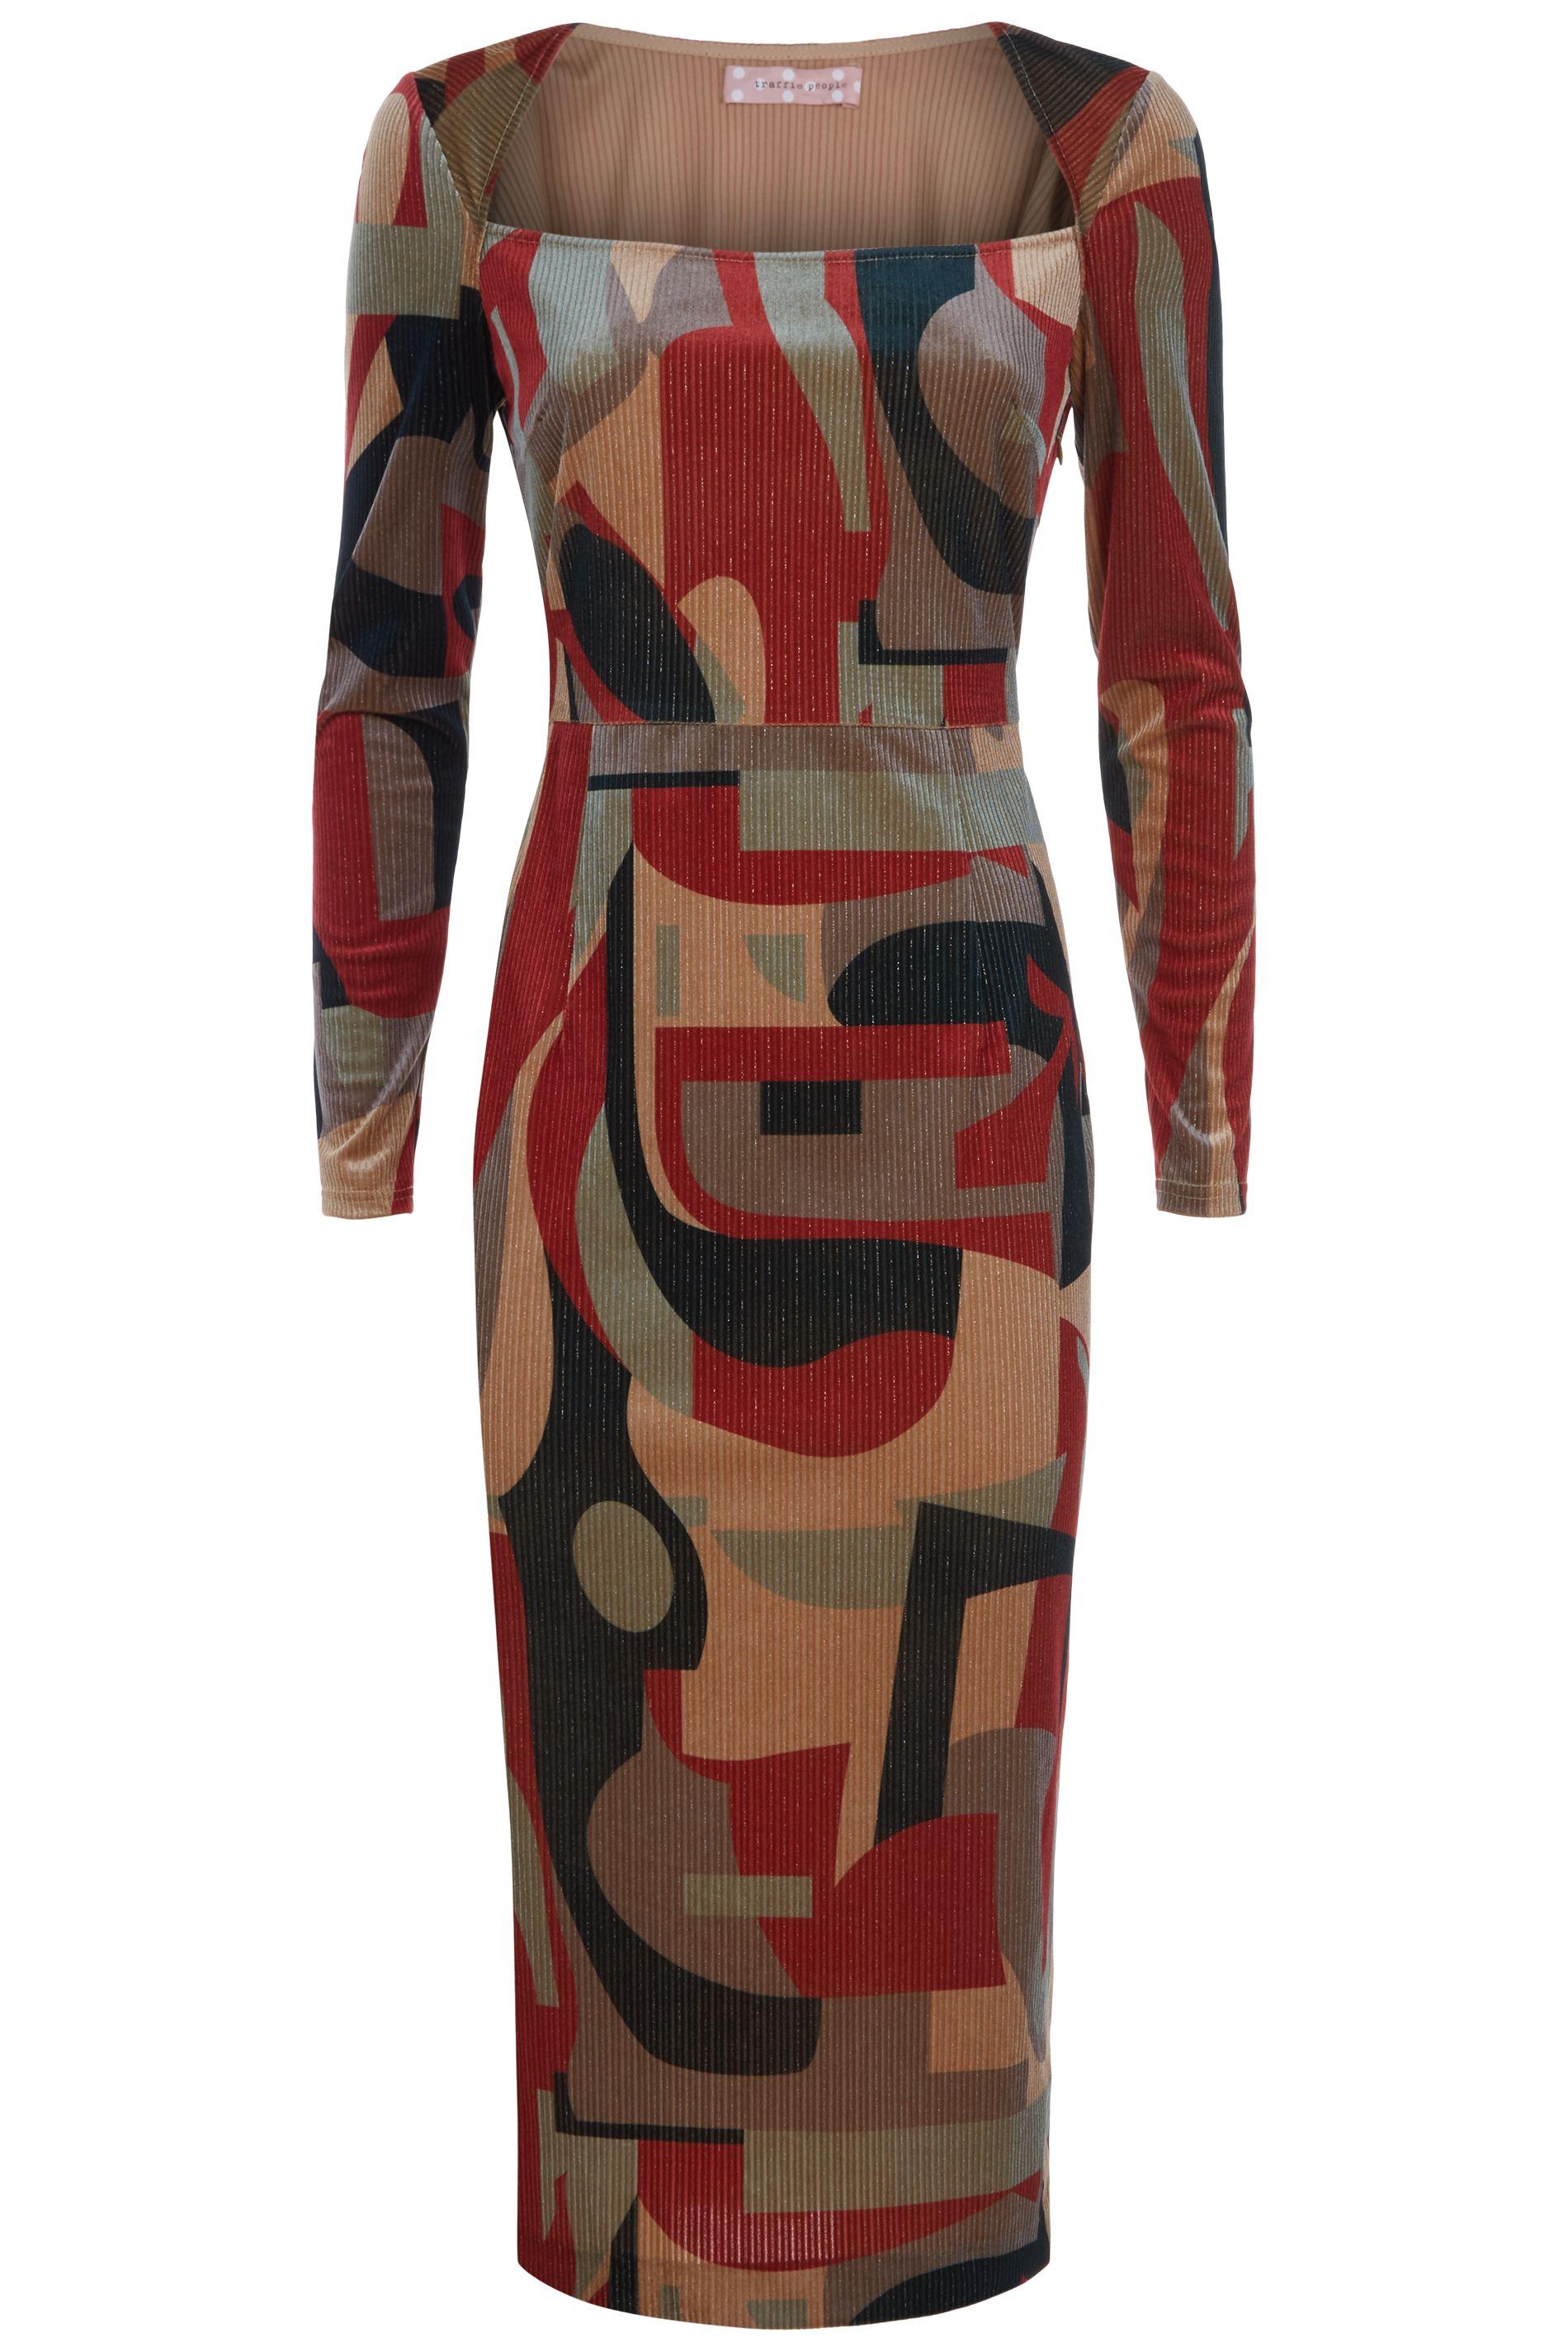 The Maud Tube Midi Dress in Rust and Beige